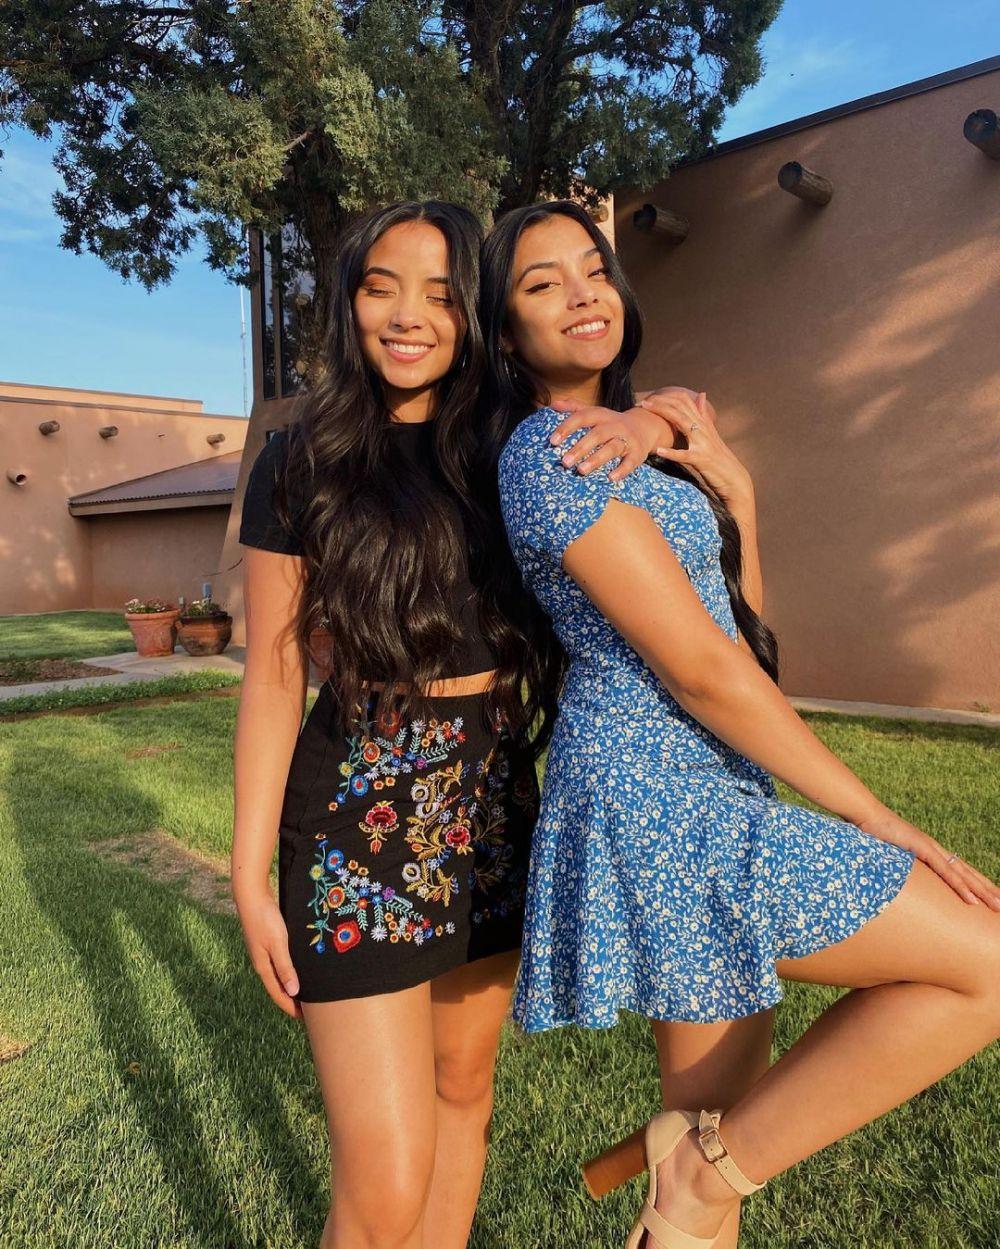 9 Fakta Mya dan Myka, YouTuber Kembar Hits Berdarah Thailand